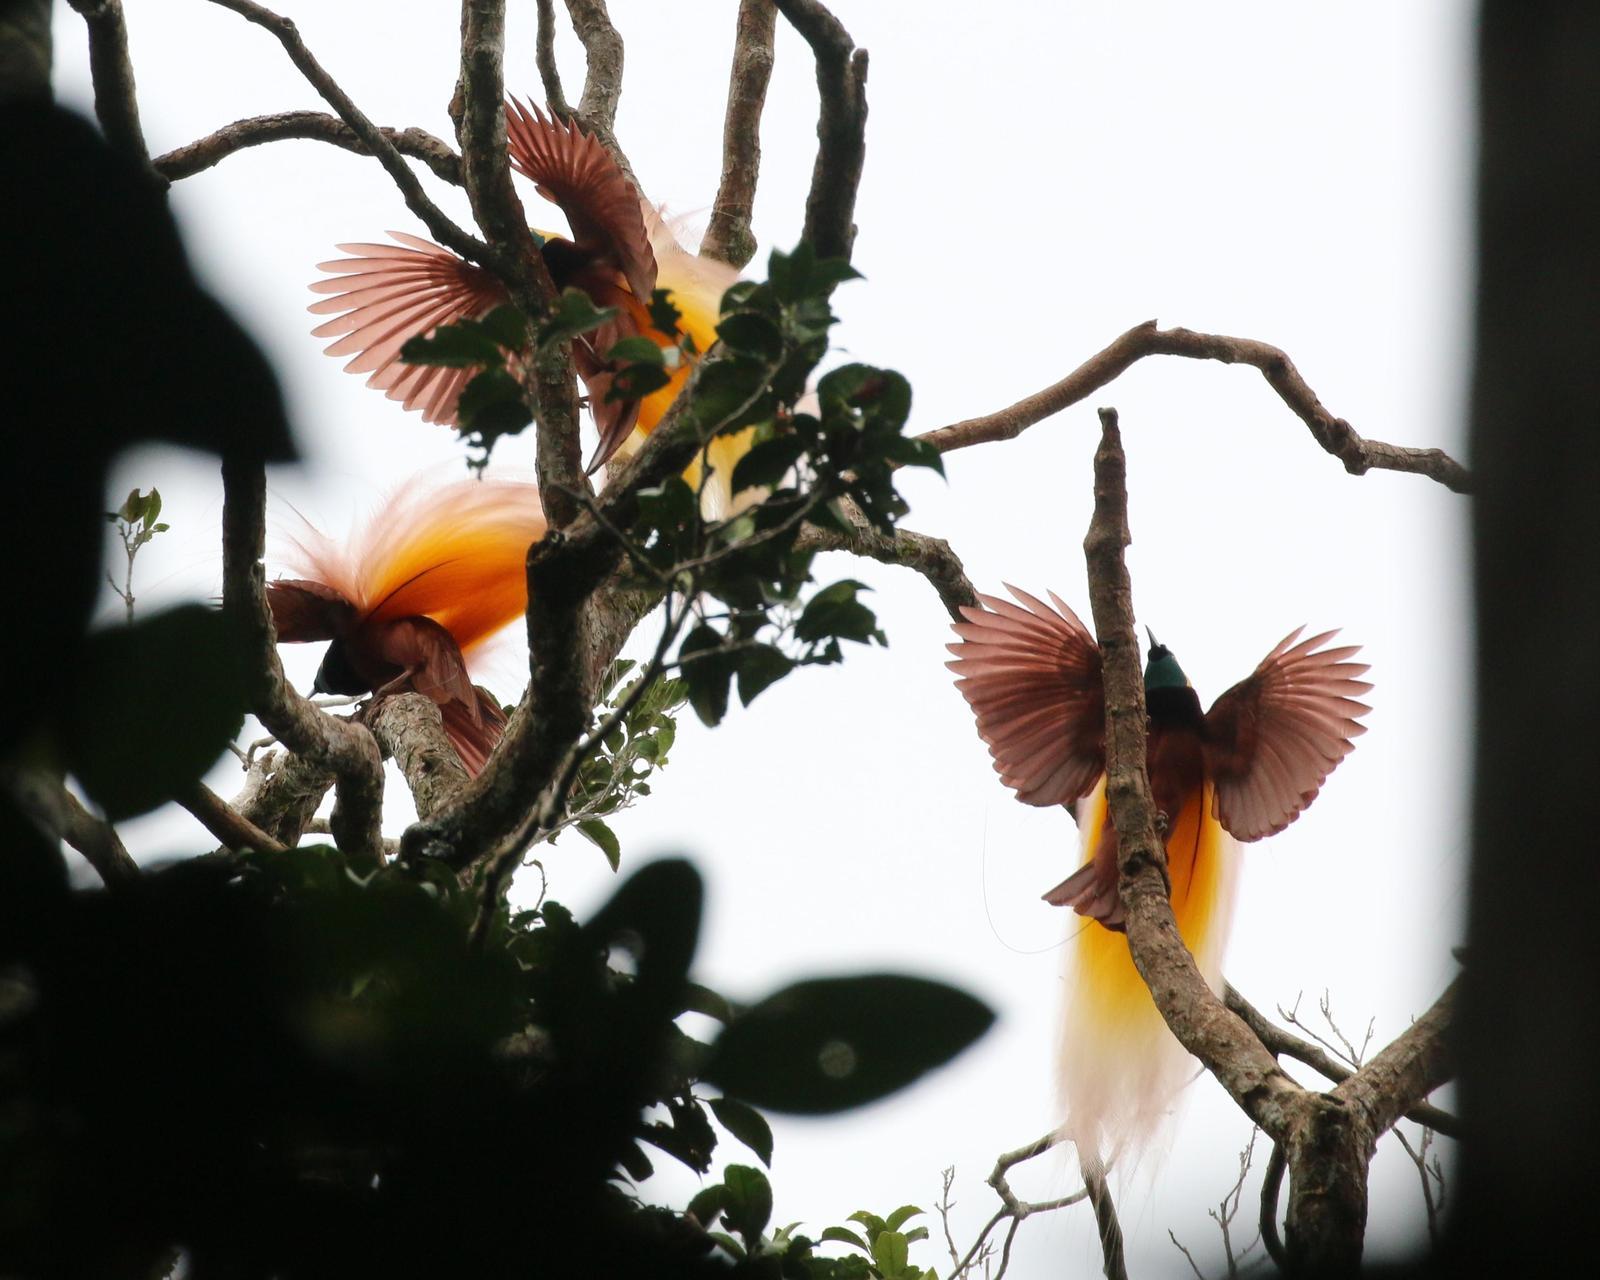 Greater Bird-of-Paradise Photo by Richard Jeffers